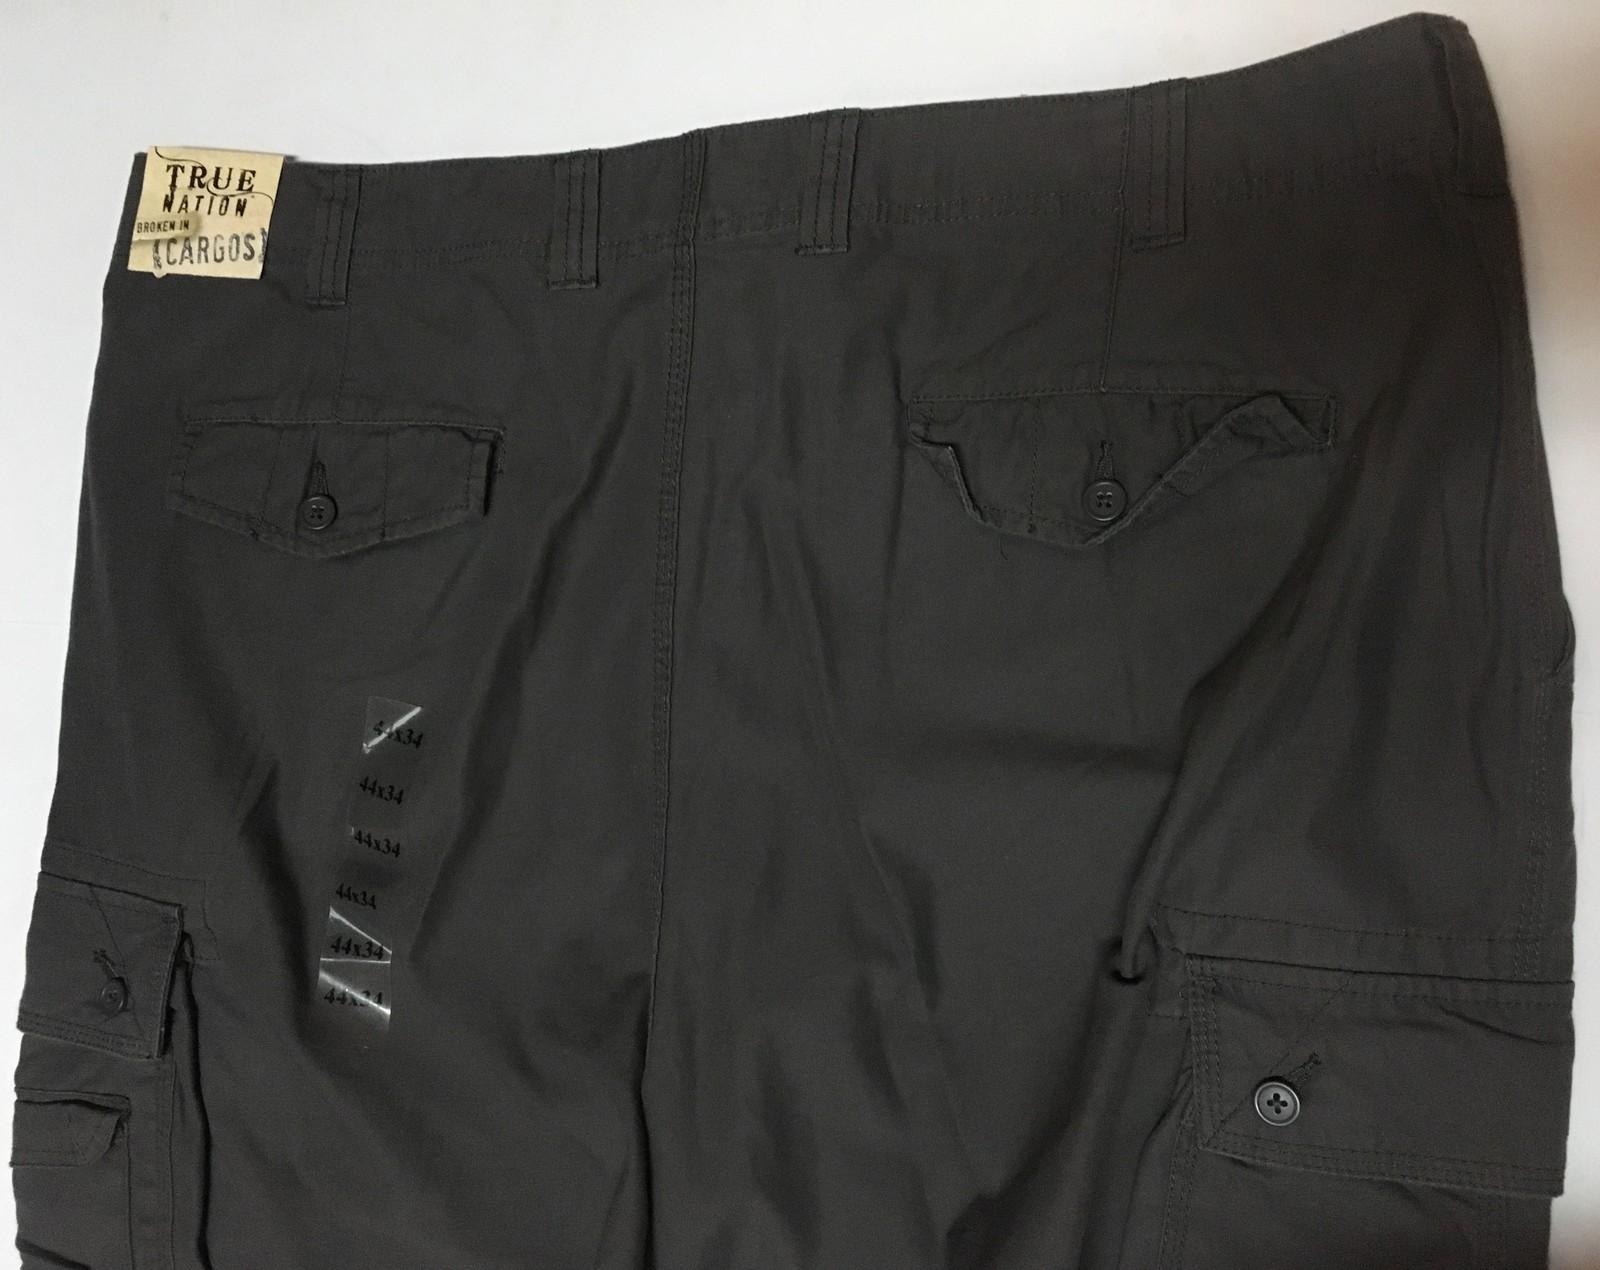 True Nation Men's Cargo Dark Grey Pants Sz 44 x 34 Flat Front NWT